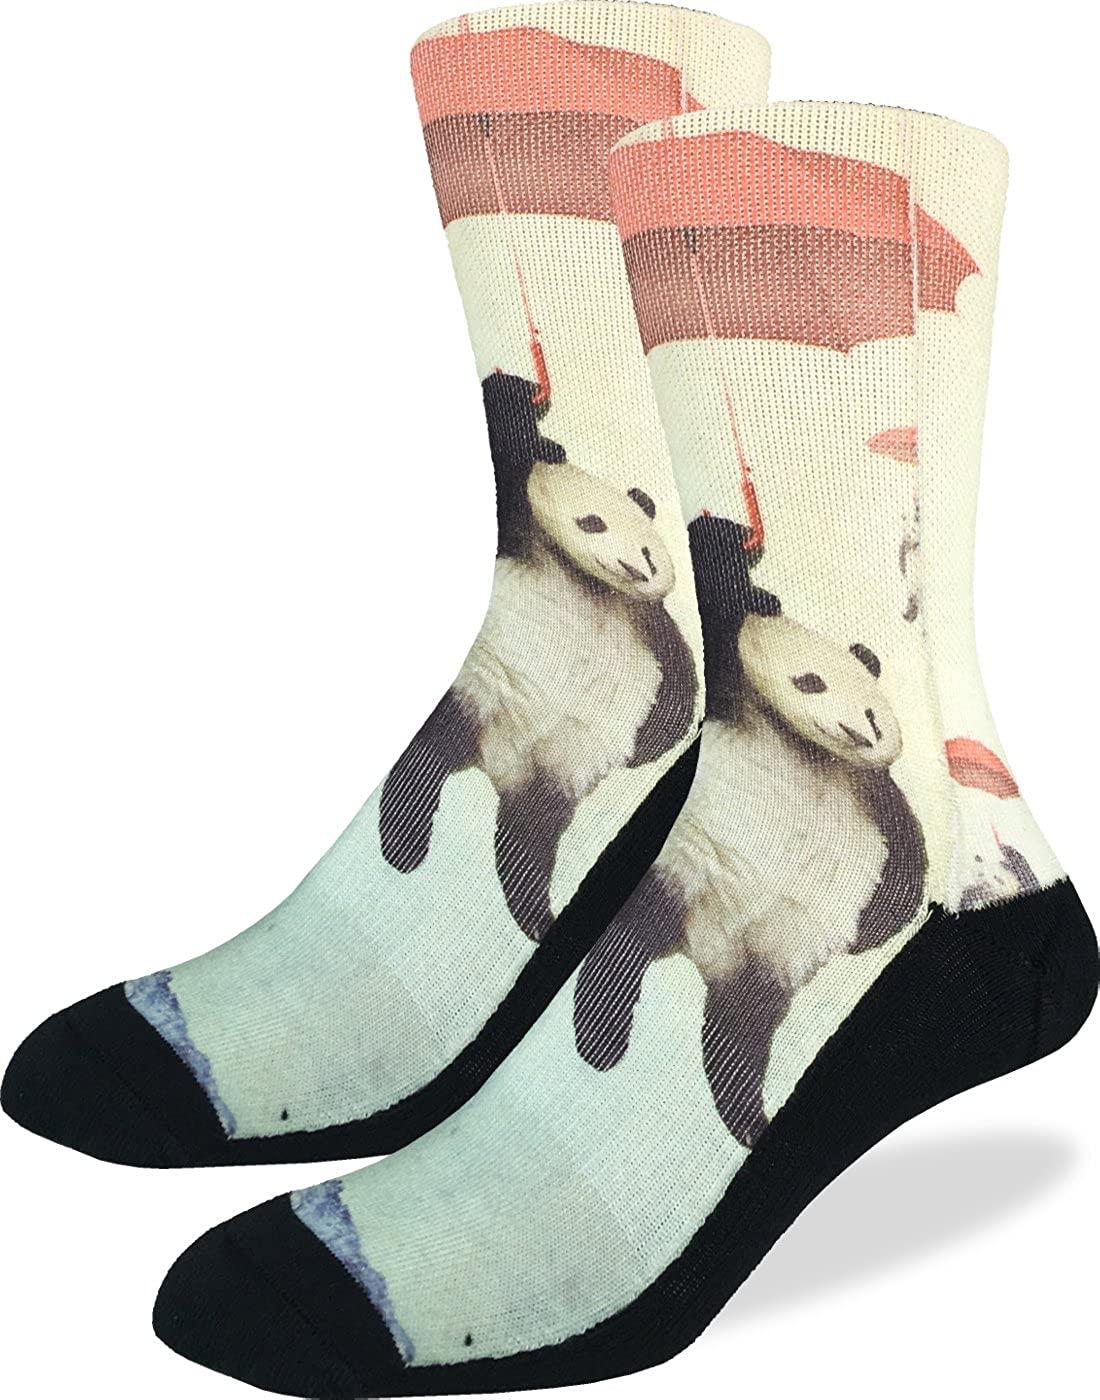 Good Luck Sock Men's Panda Crew Socks - Grey, Adult Shoe Size 8-13